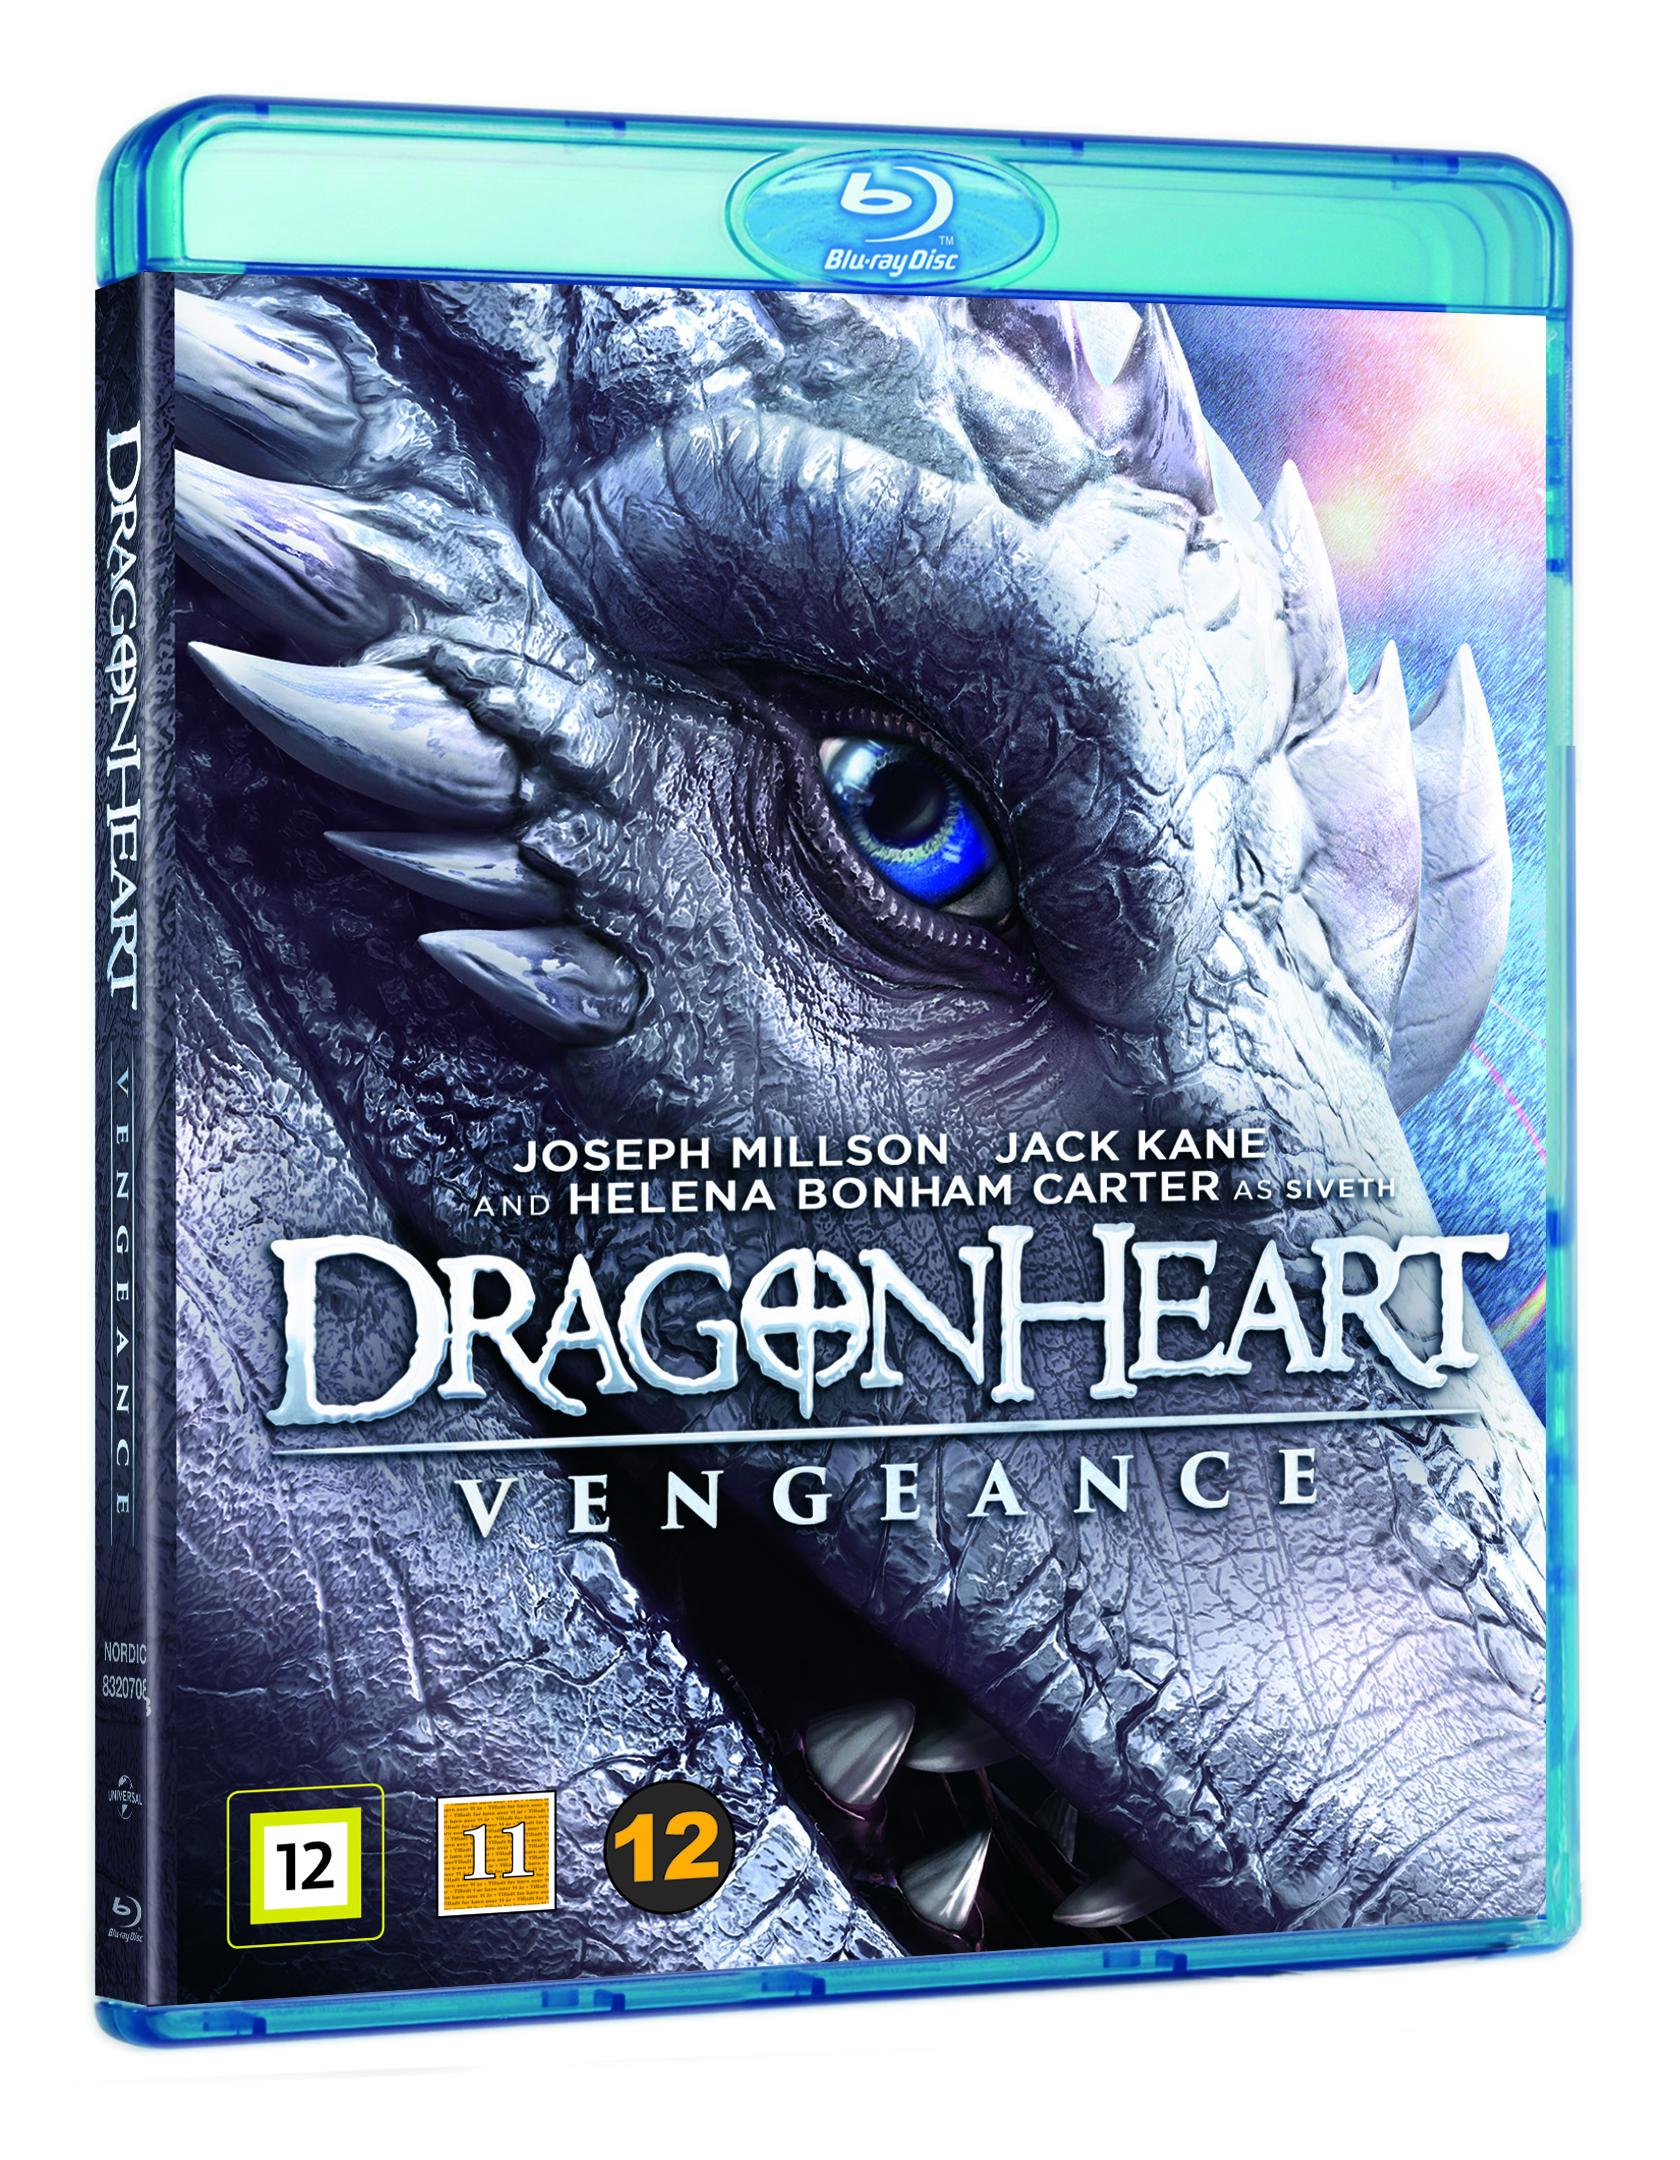 Dragonheart: Vengeance - Blu ray